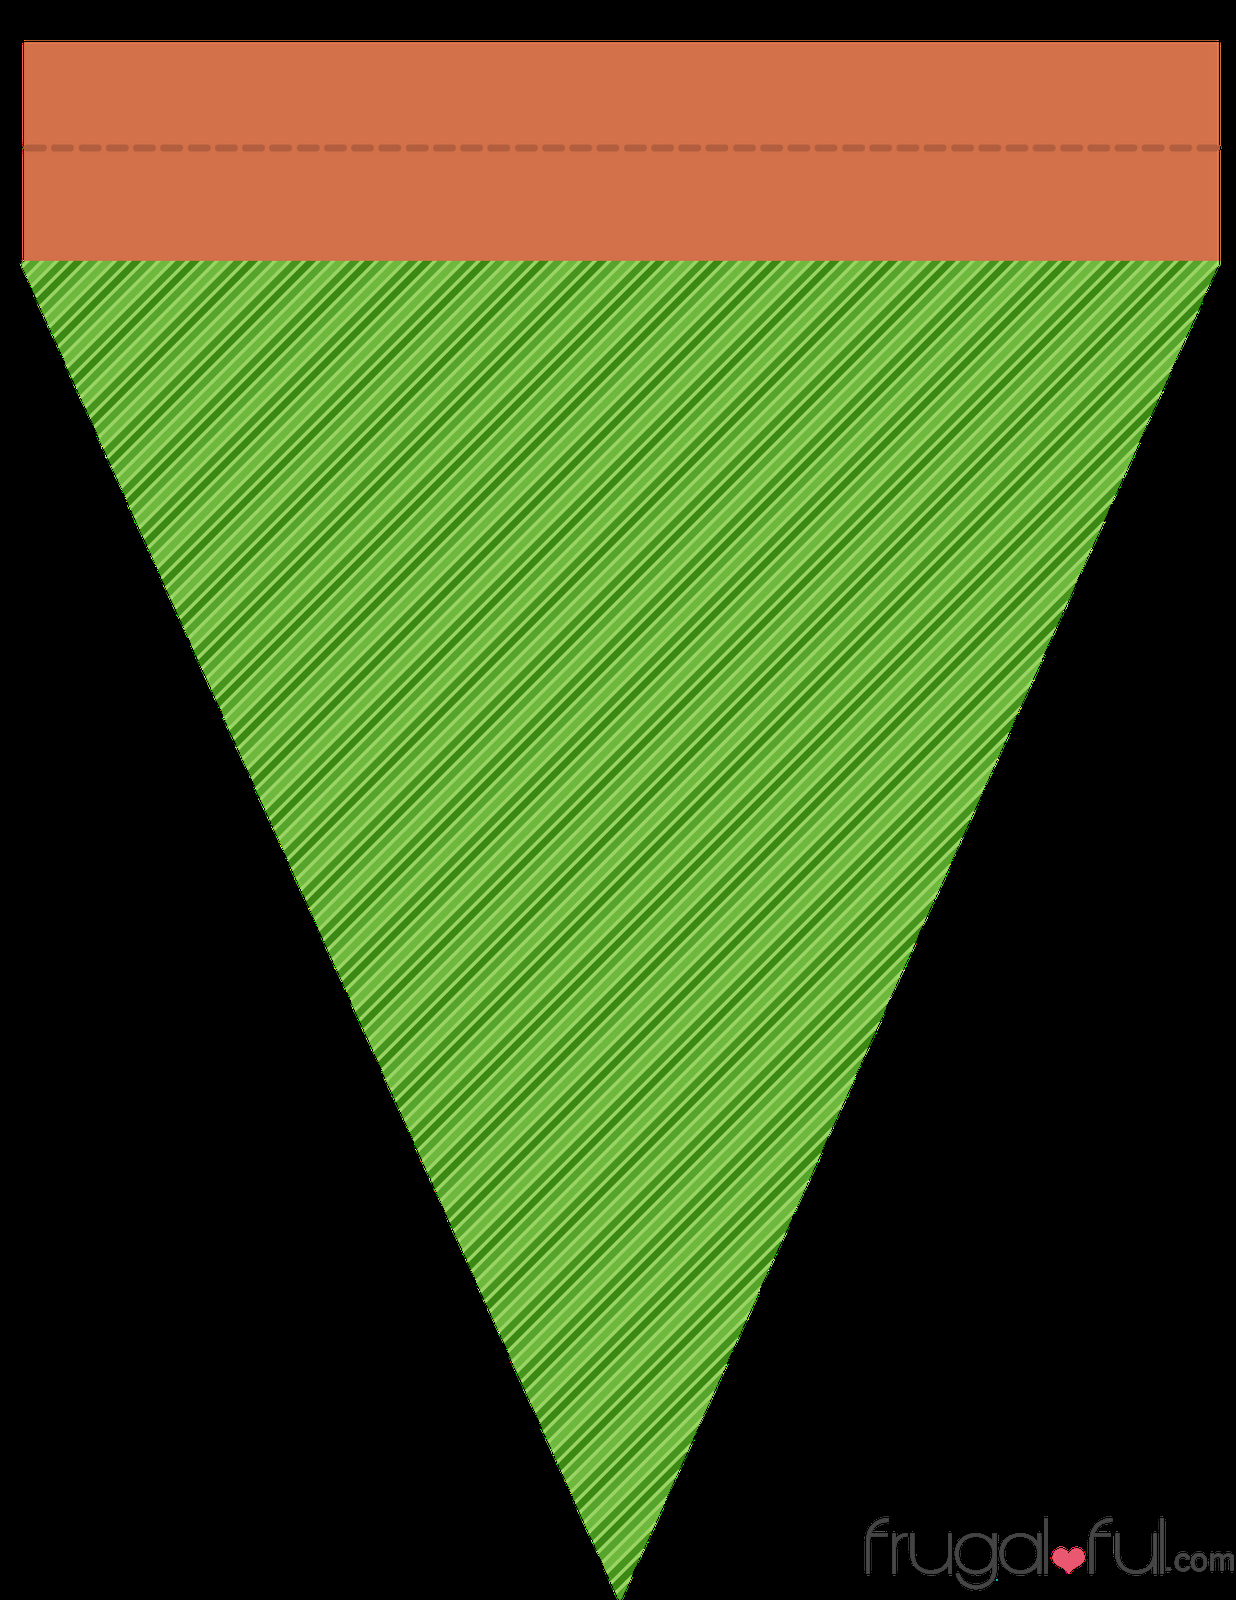 Banner Triangle Template Beautiful Diy Free Printable Halloween Triangle Banner Template